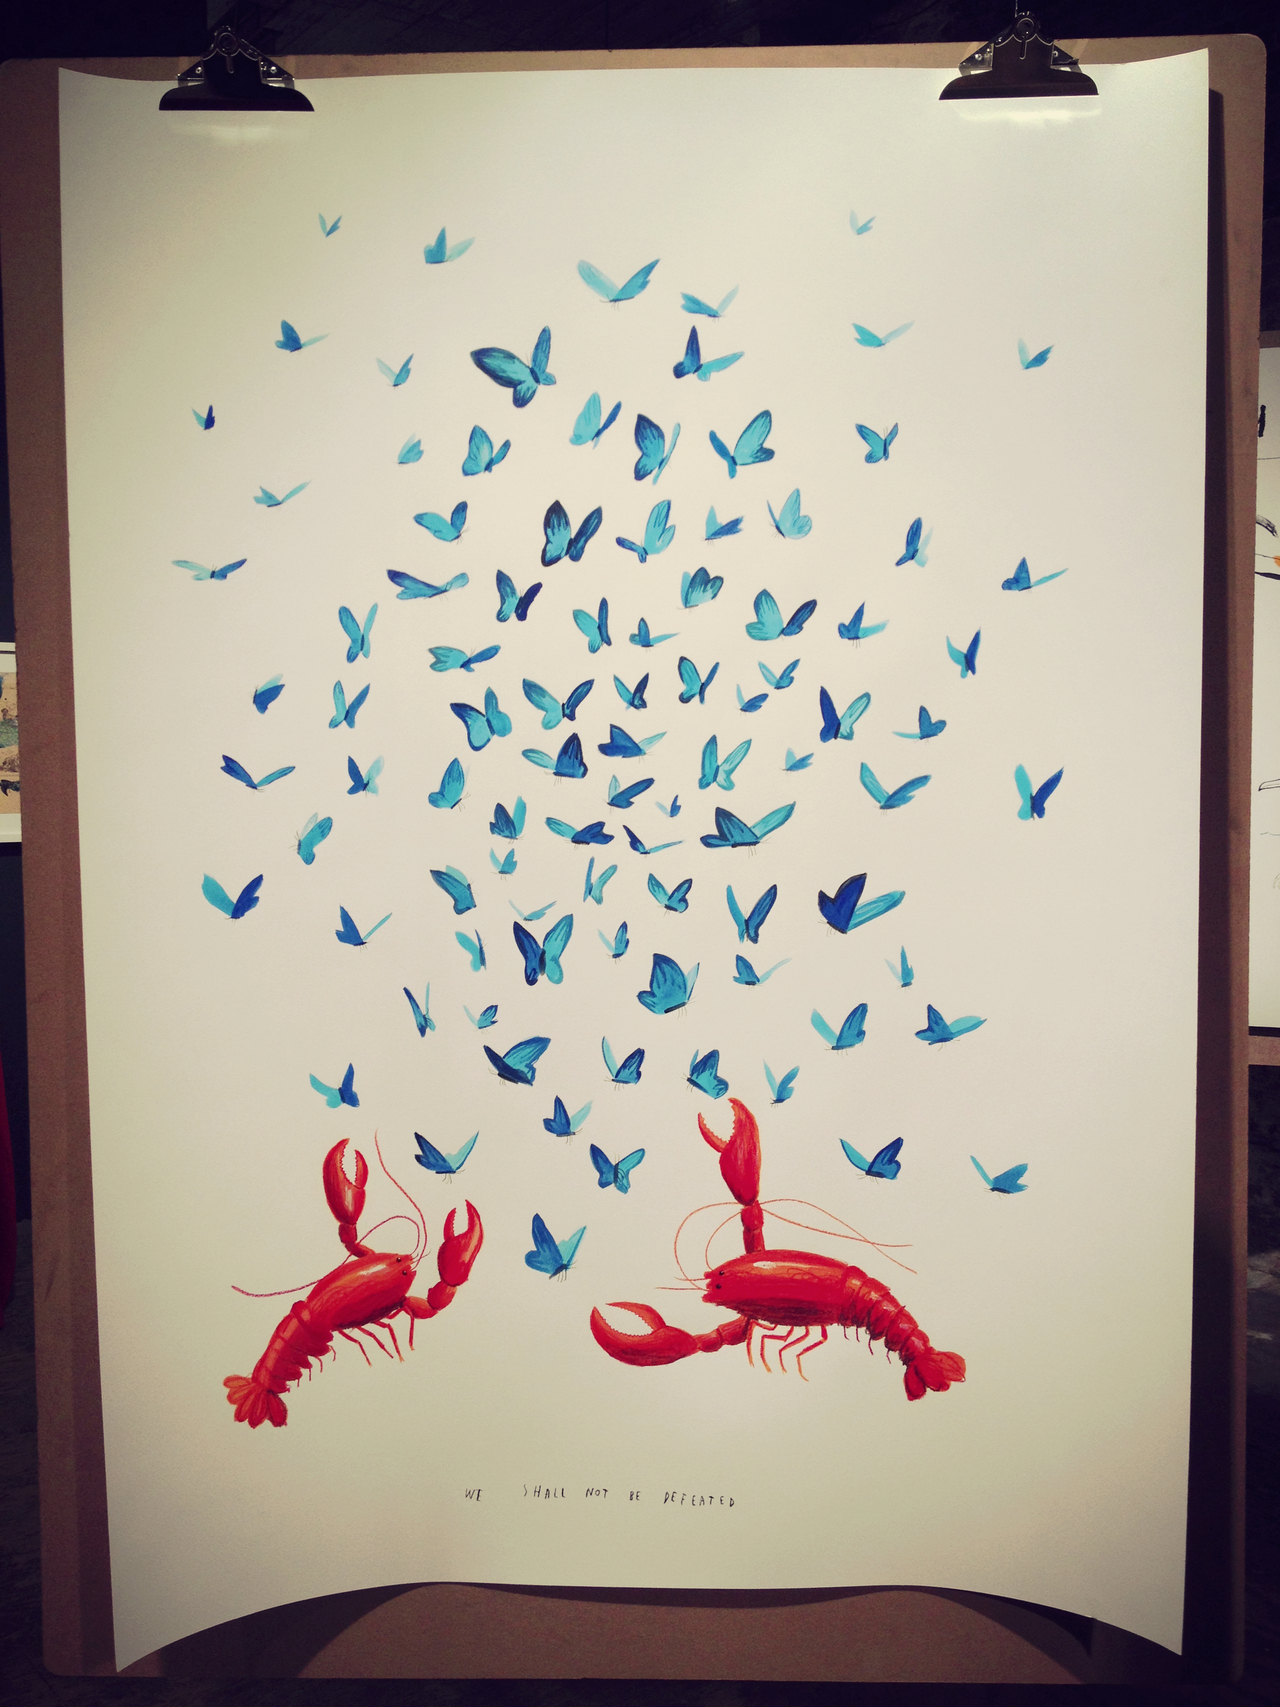 Lobster & Butterflies by Mul Holland Hwang #peppersearching #pepper #photos #lobster #butterflies #red #art #blue